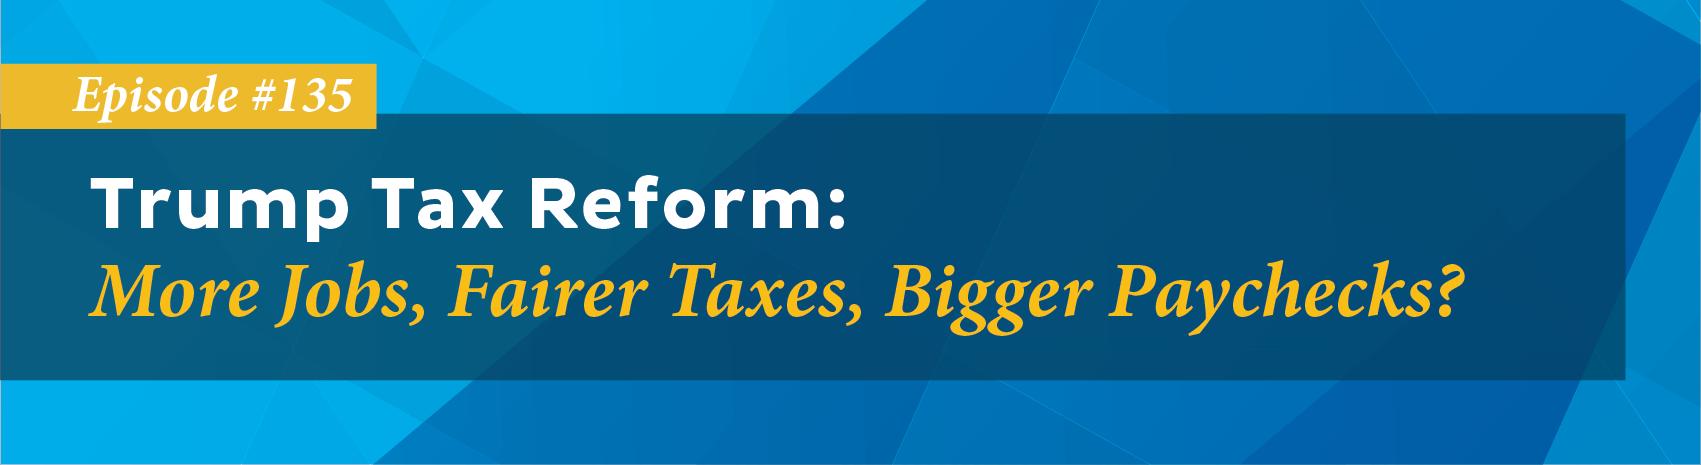 Trump Tax Reform: More Jobs, Fairer Taxes, Bigger Paychecks?